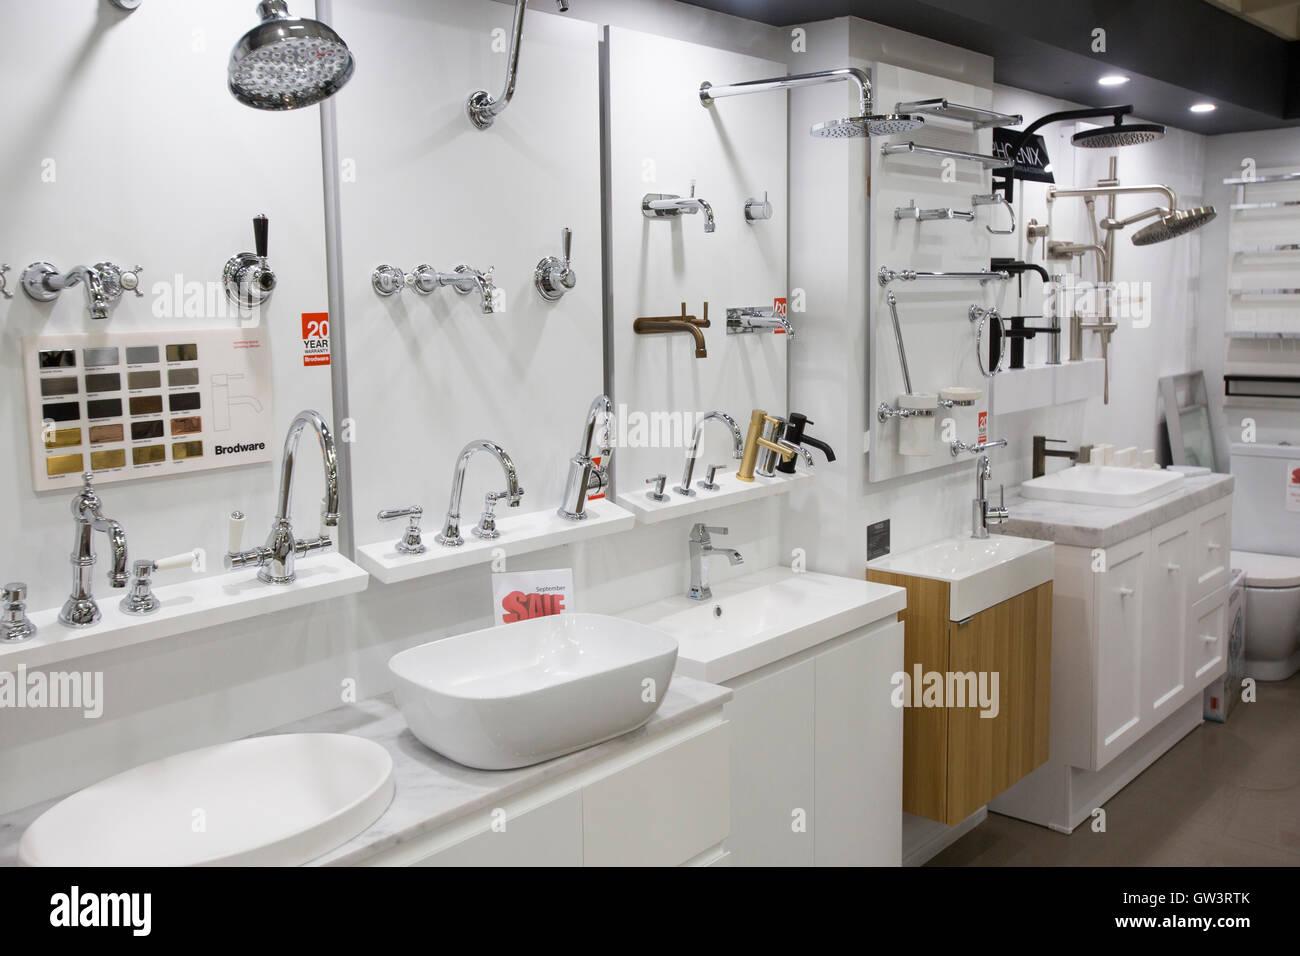 Bathroom sanitary ware showroom retailer in Sydney,New ... Modern Sanitary Ware Showroom